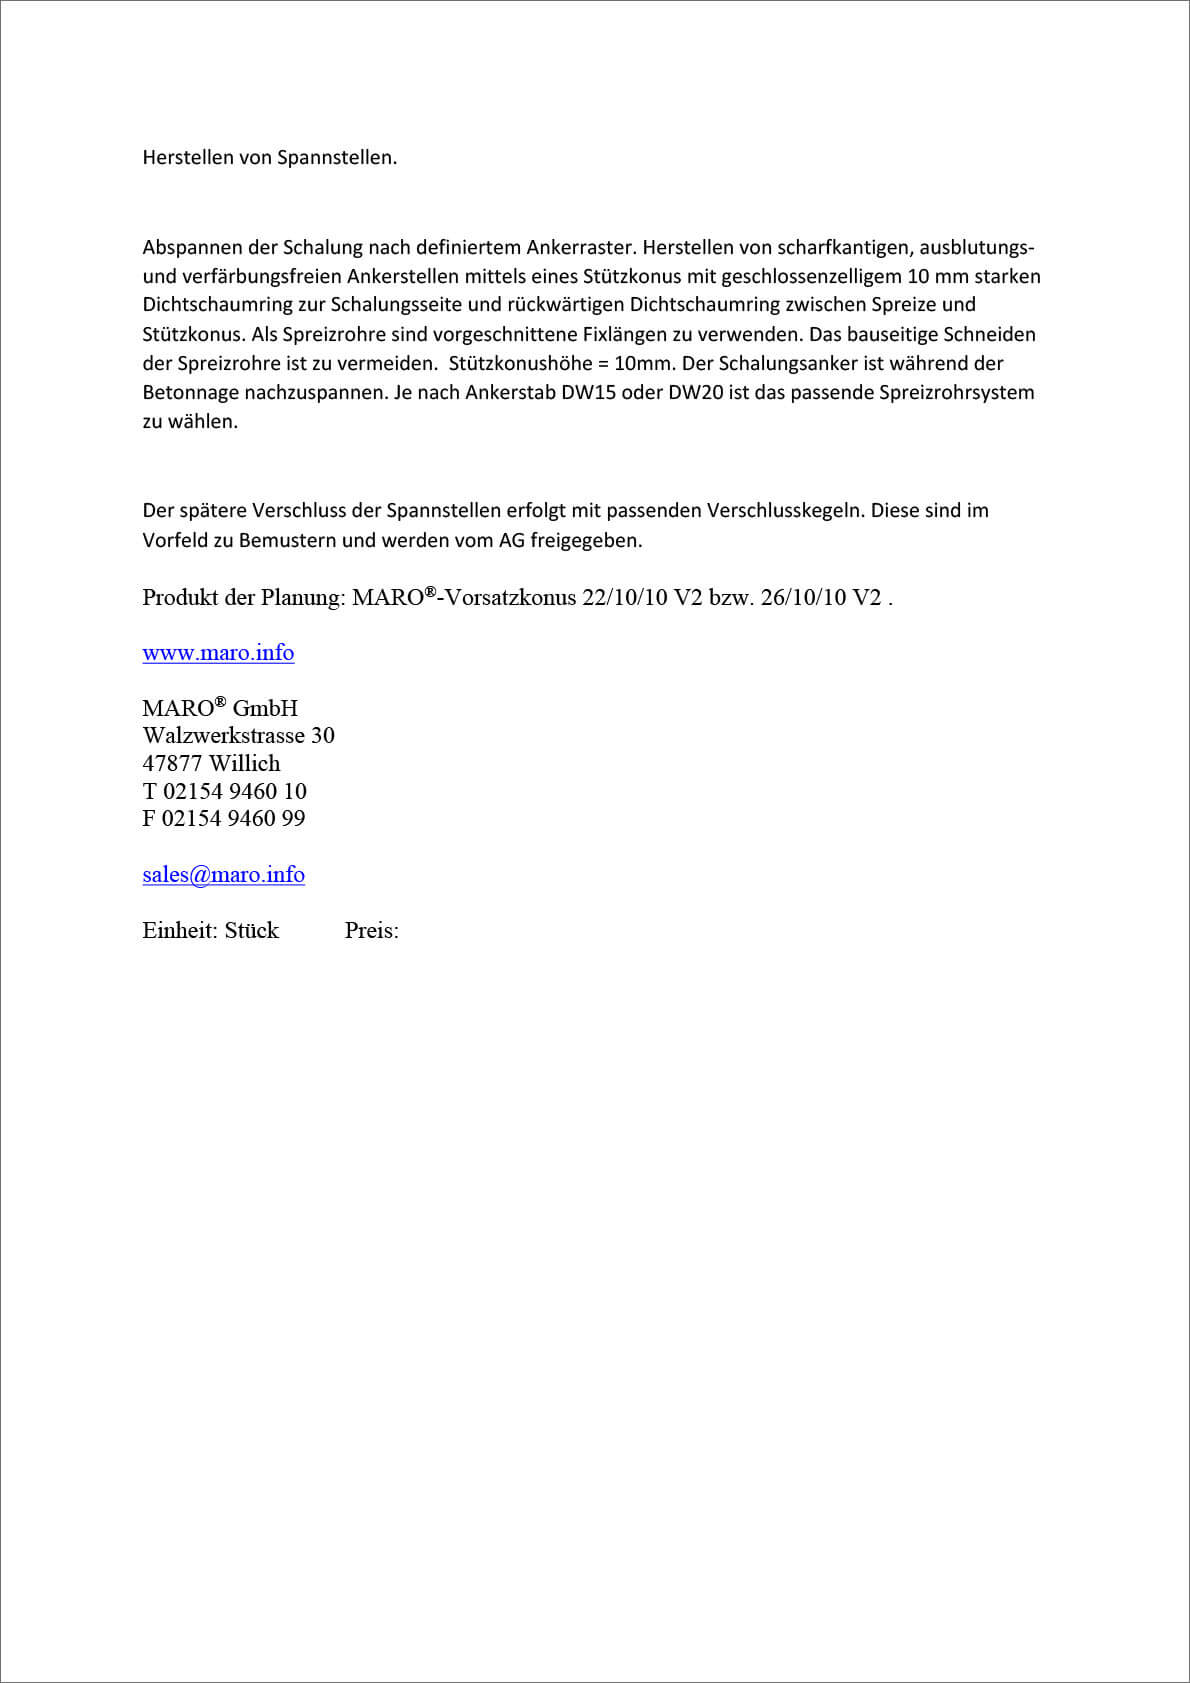 Vorsatzkonus 22/10/10 V2 bzw. 26/10/10 V2